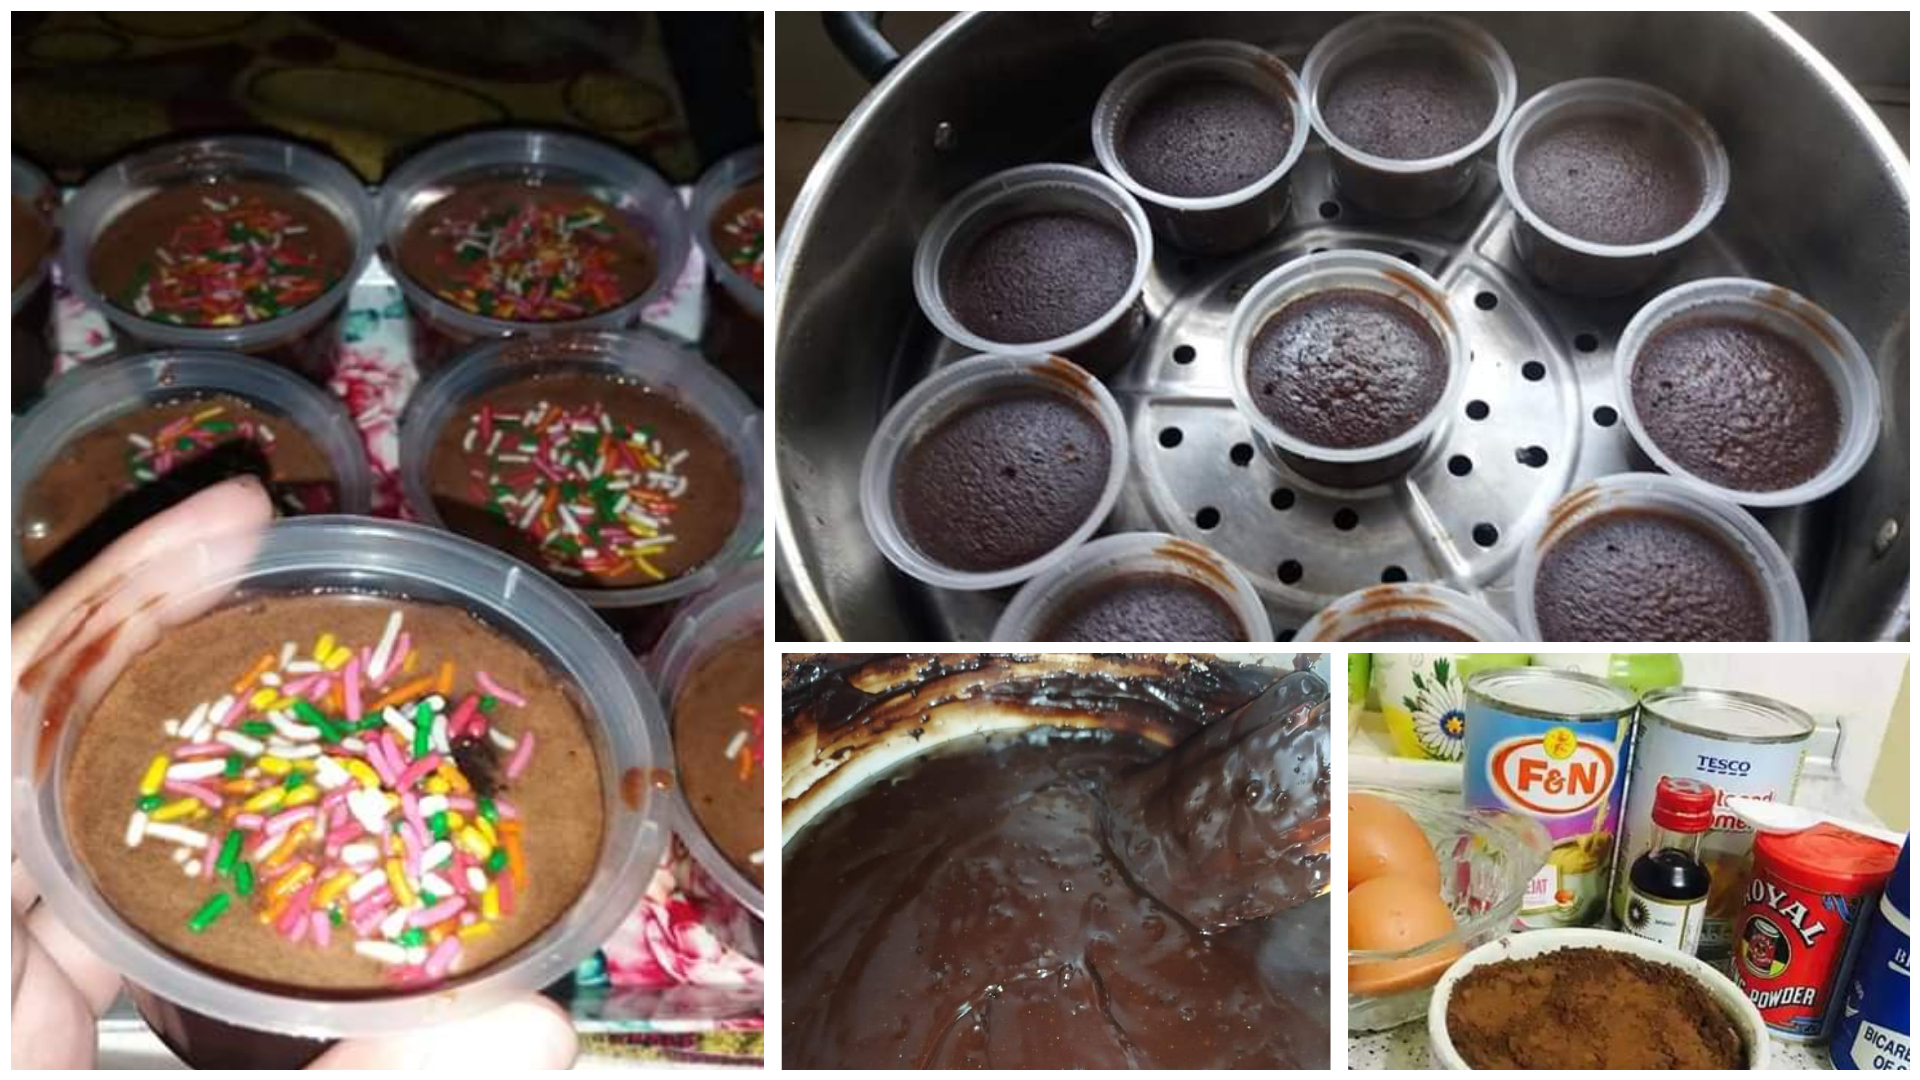 olahan resepi kek coklat kukus mudah  sedap foody bloggers Resepi Kek Coklat Moist Bakar Enak dan Mudah